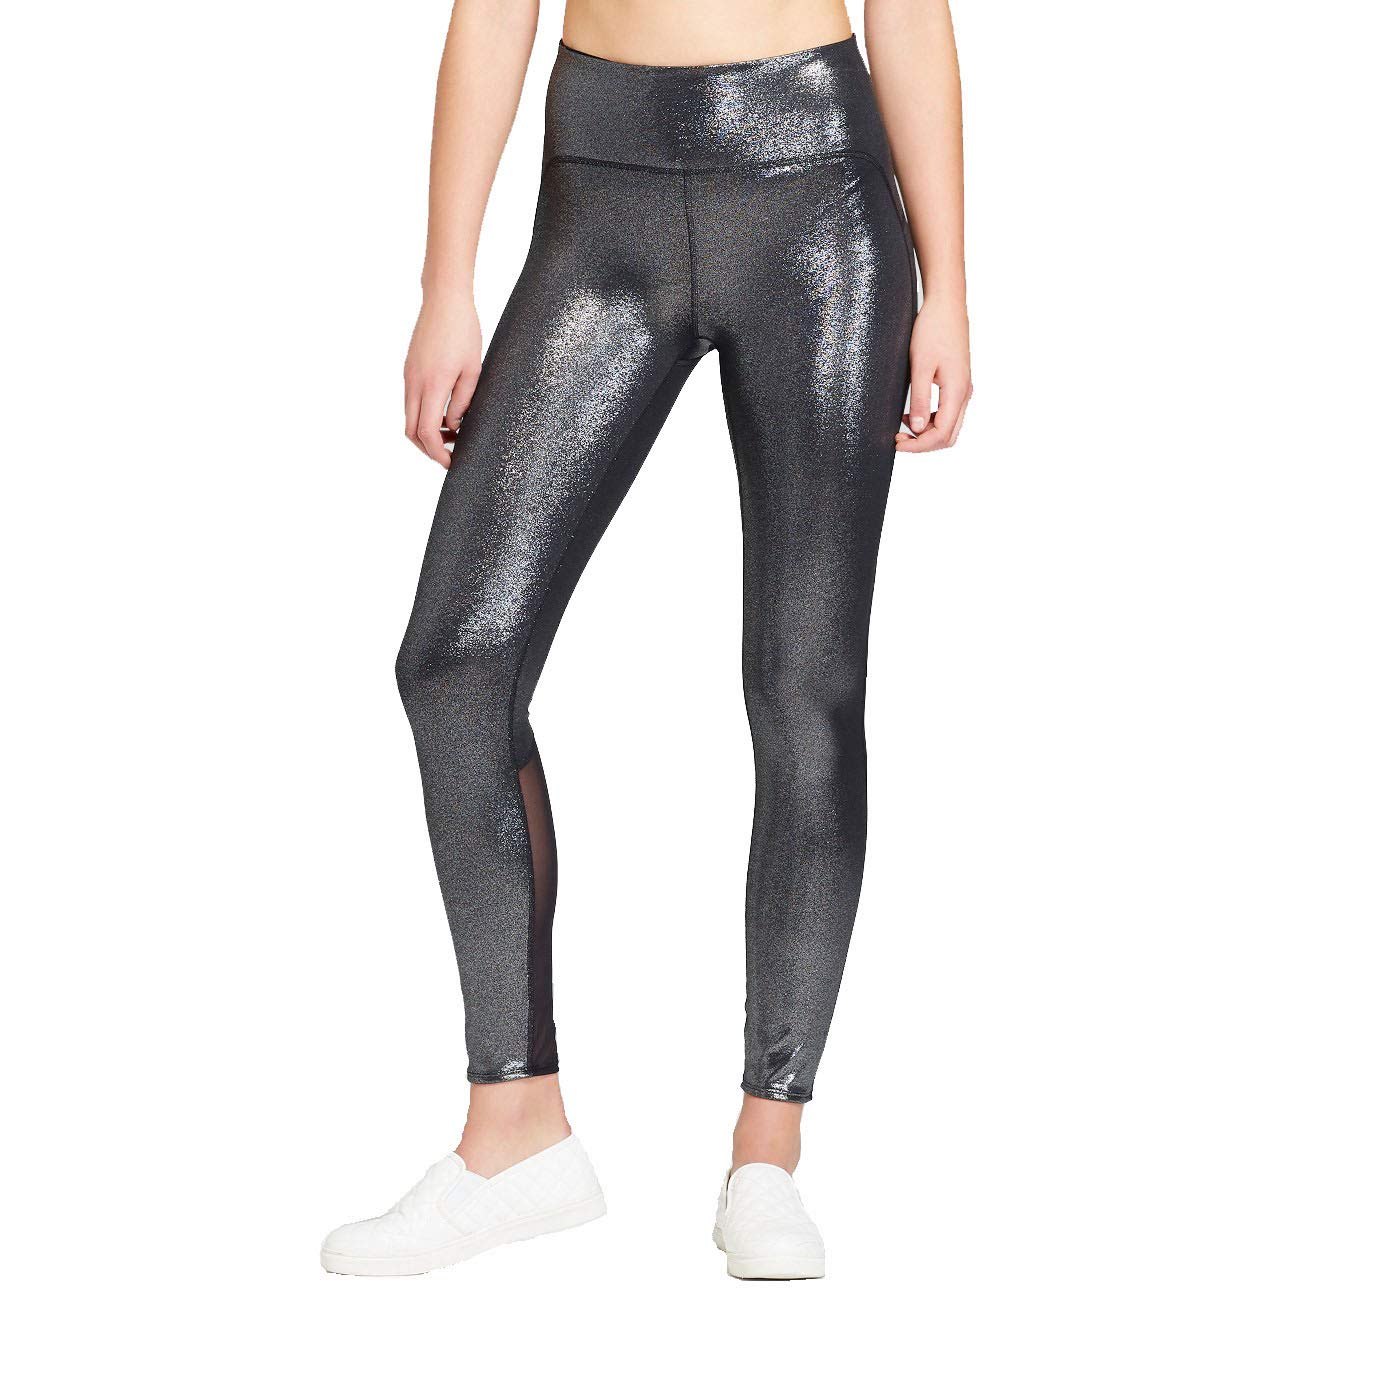 1e22fca3ca30e JoyLab Women's High-Waisted 7/8 Shine Leggings Black at Amazon Women's  Clothing store: